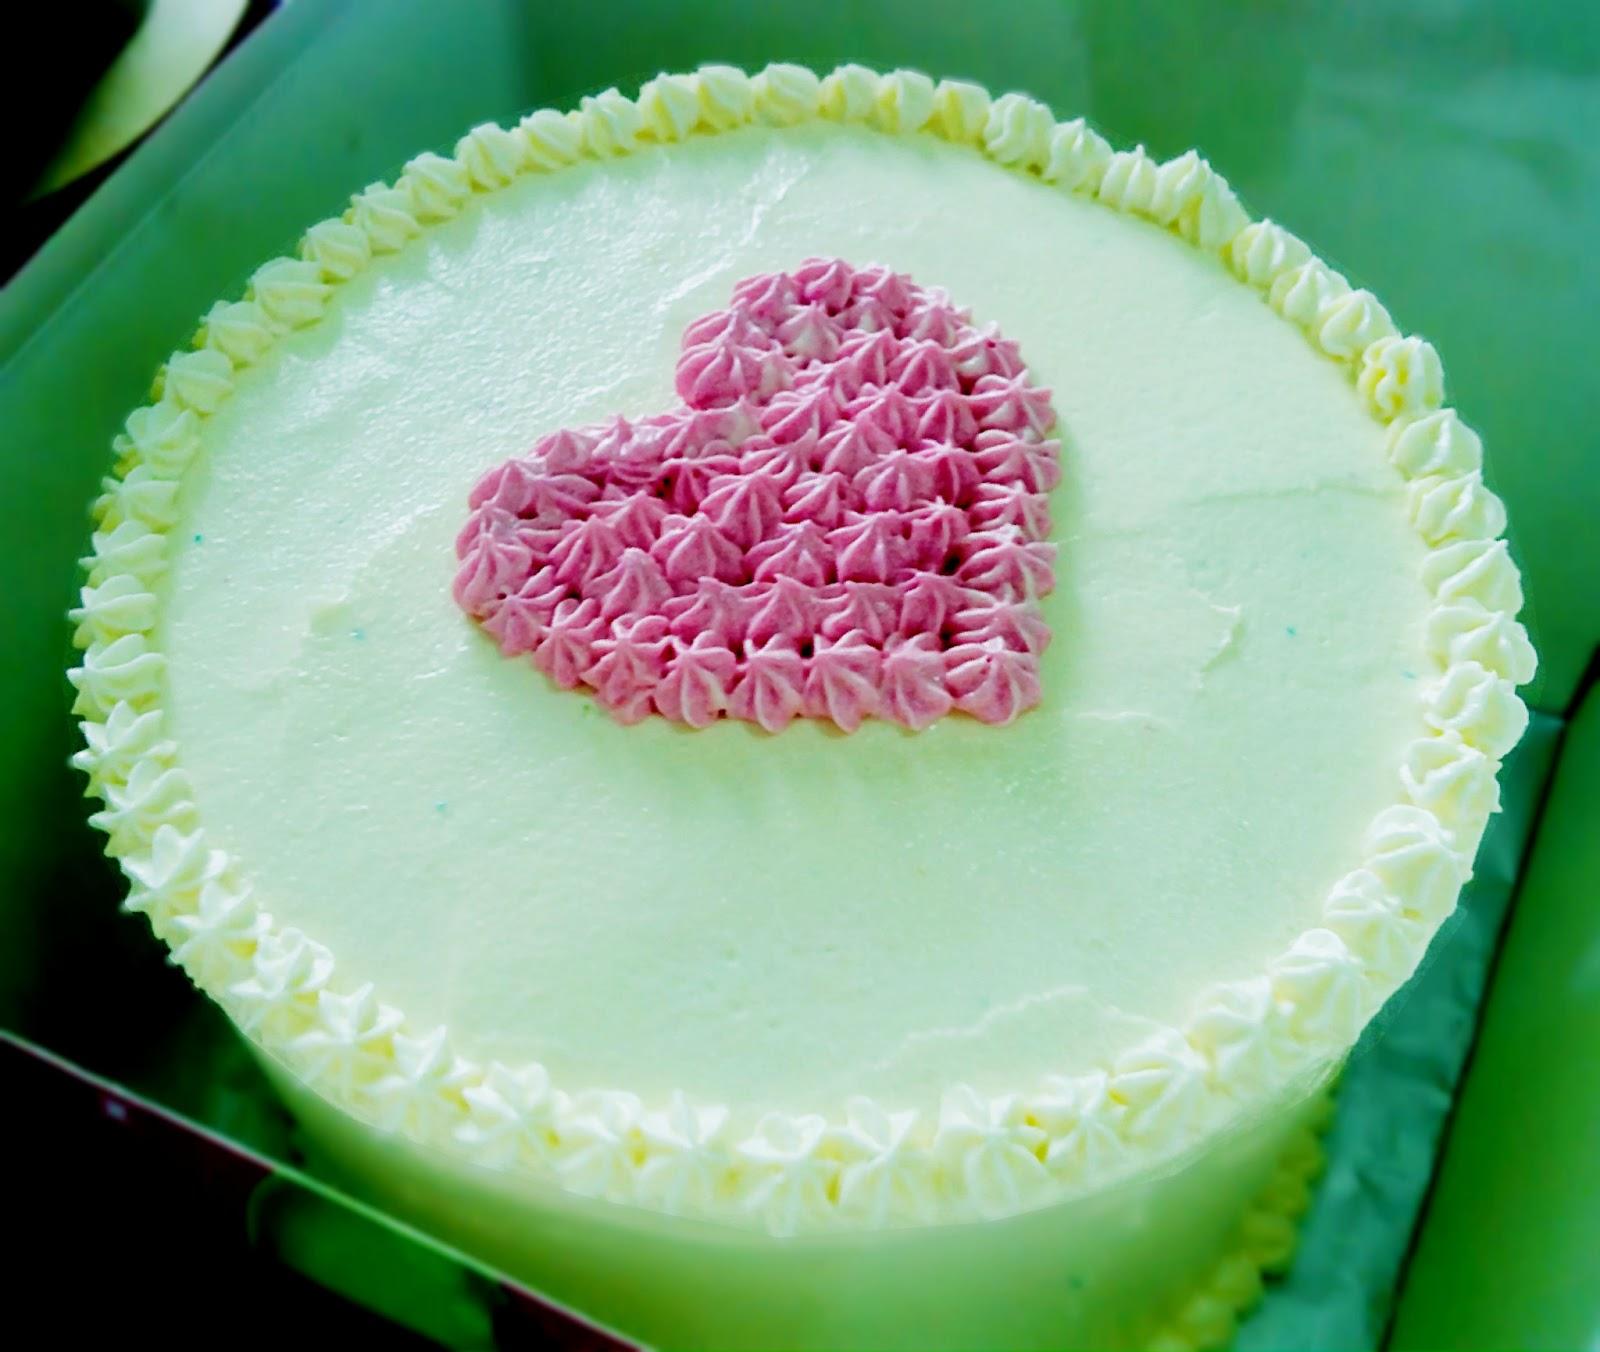 Cakes etc simple heart shape cake deco